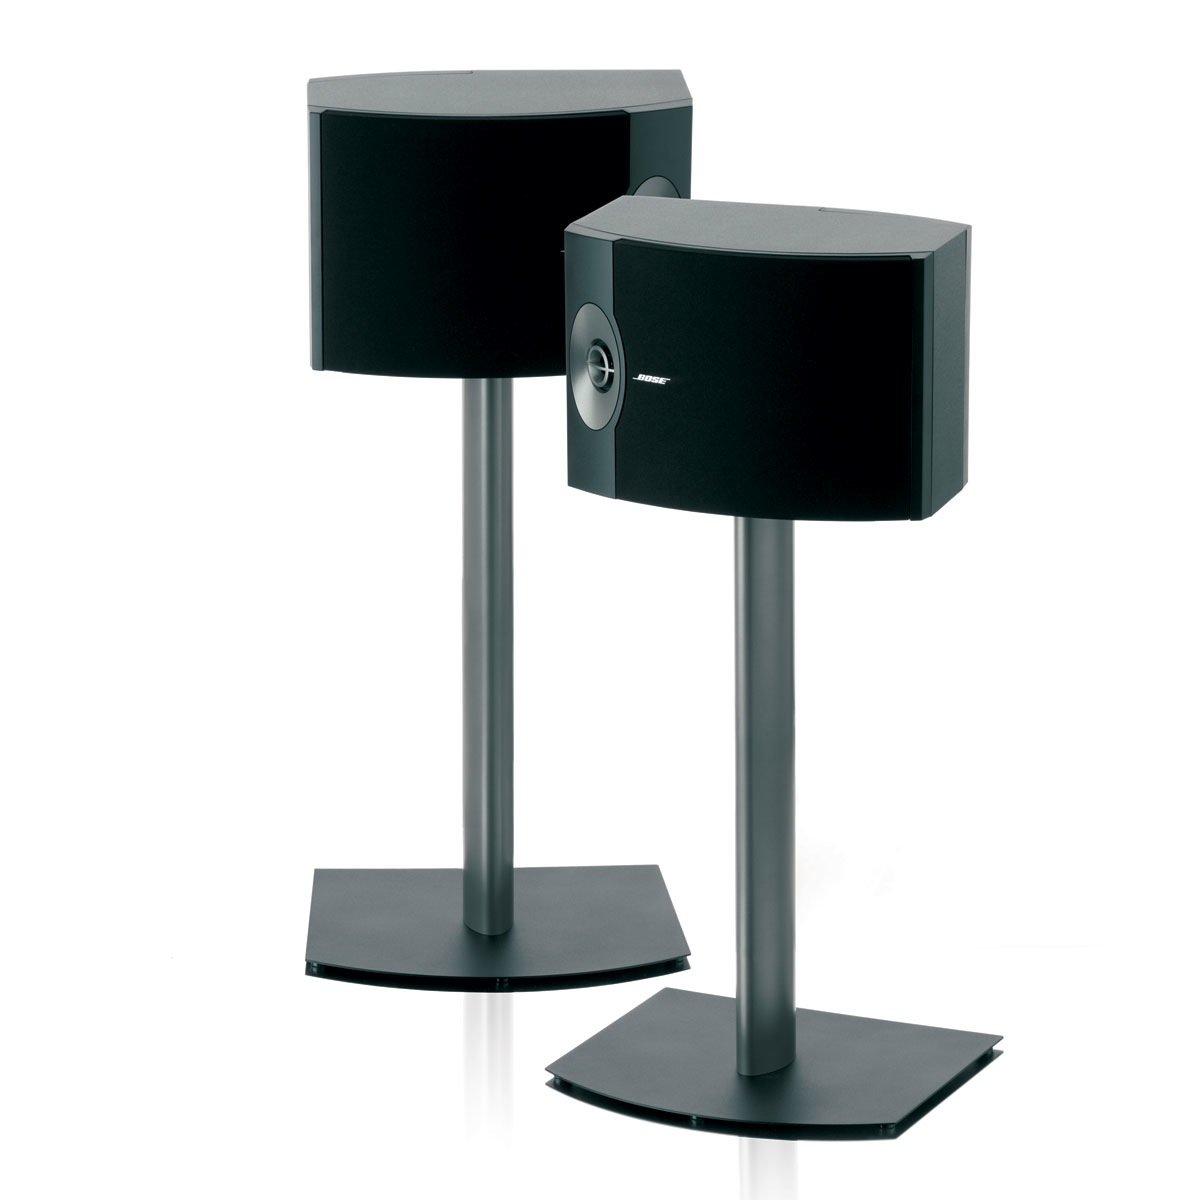 Bose 301-V Stereo Loudspeakers (Pair, Black) by Bose (Image #3)